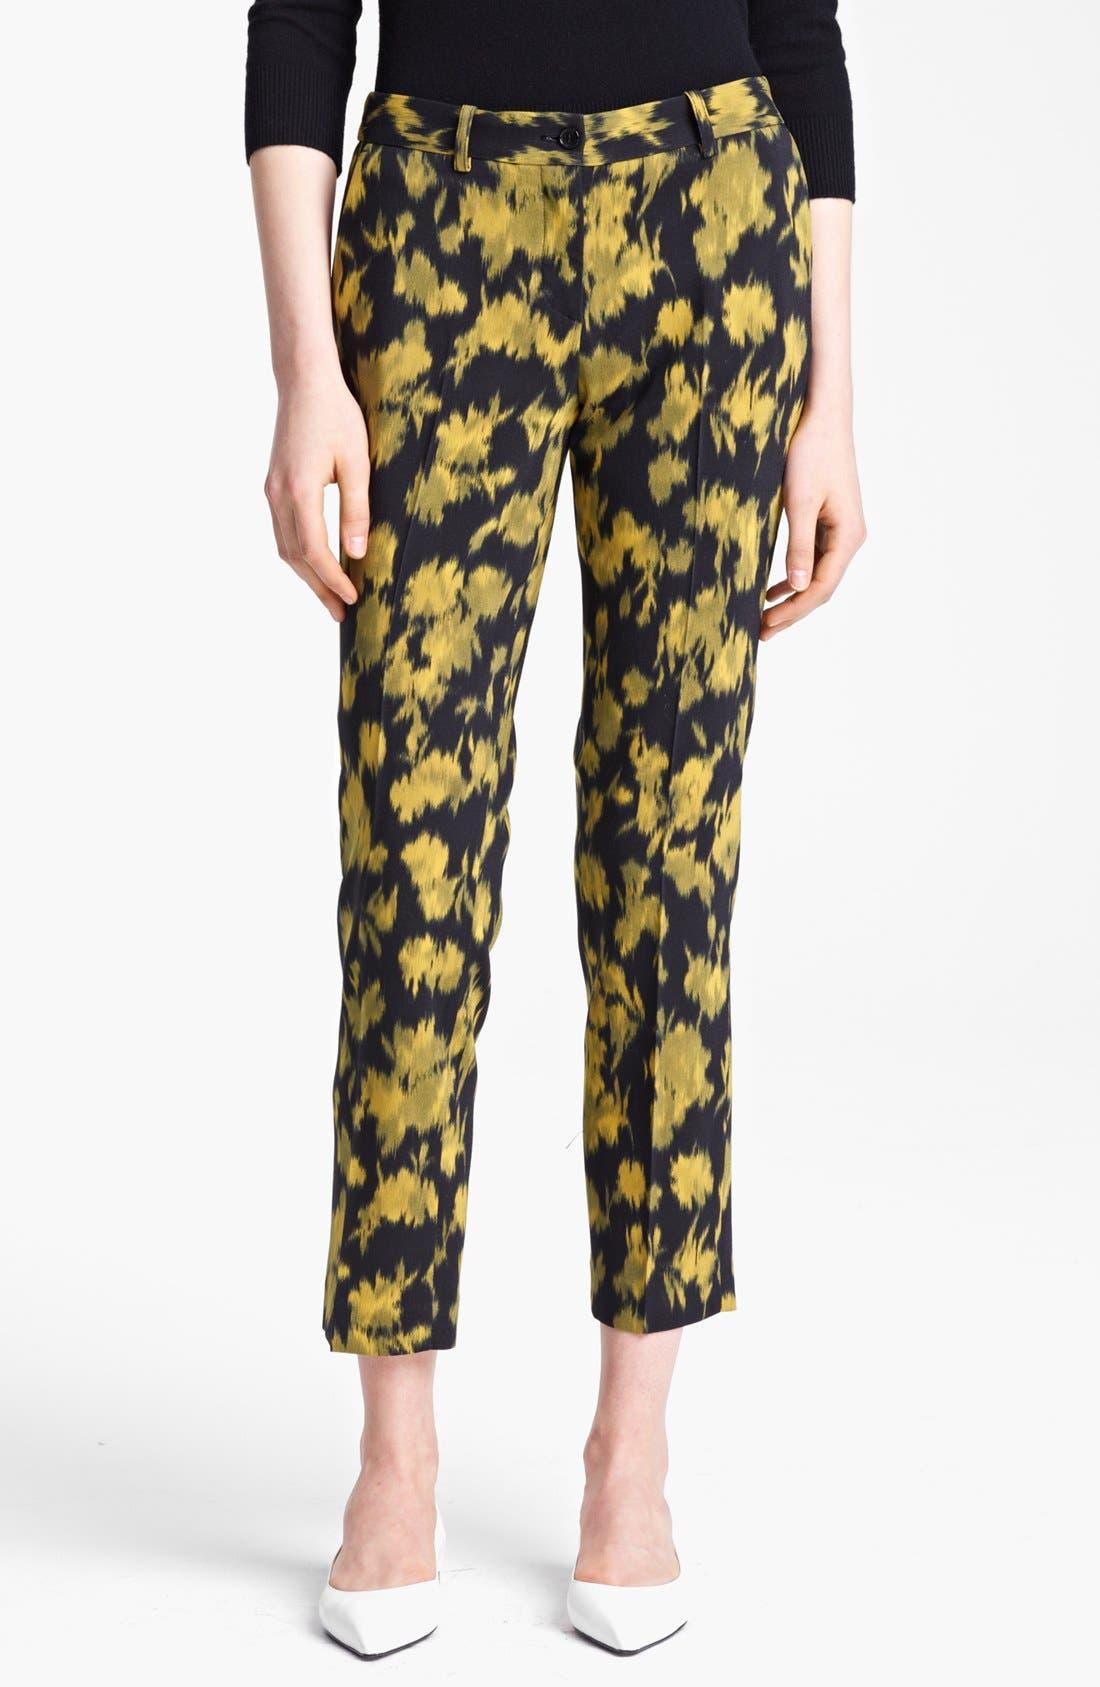 Main Image - Michael Kors 'Samantha' Print Skinny Stretch Wool Pants